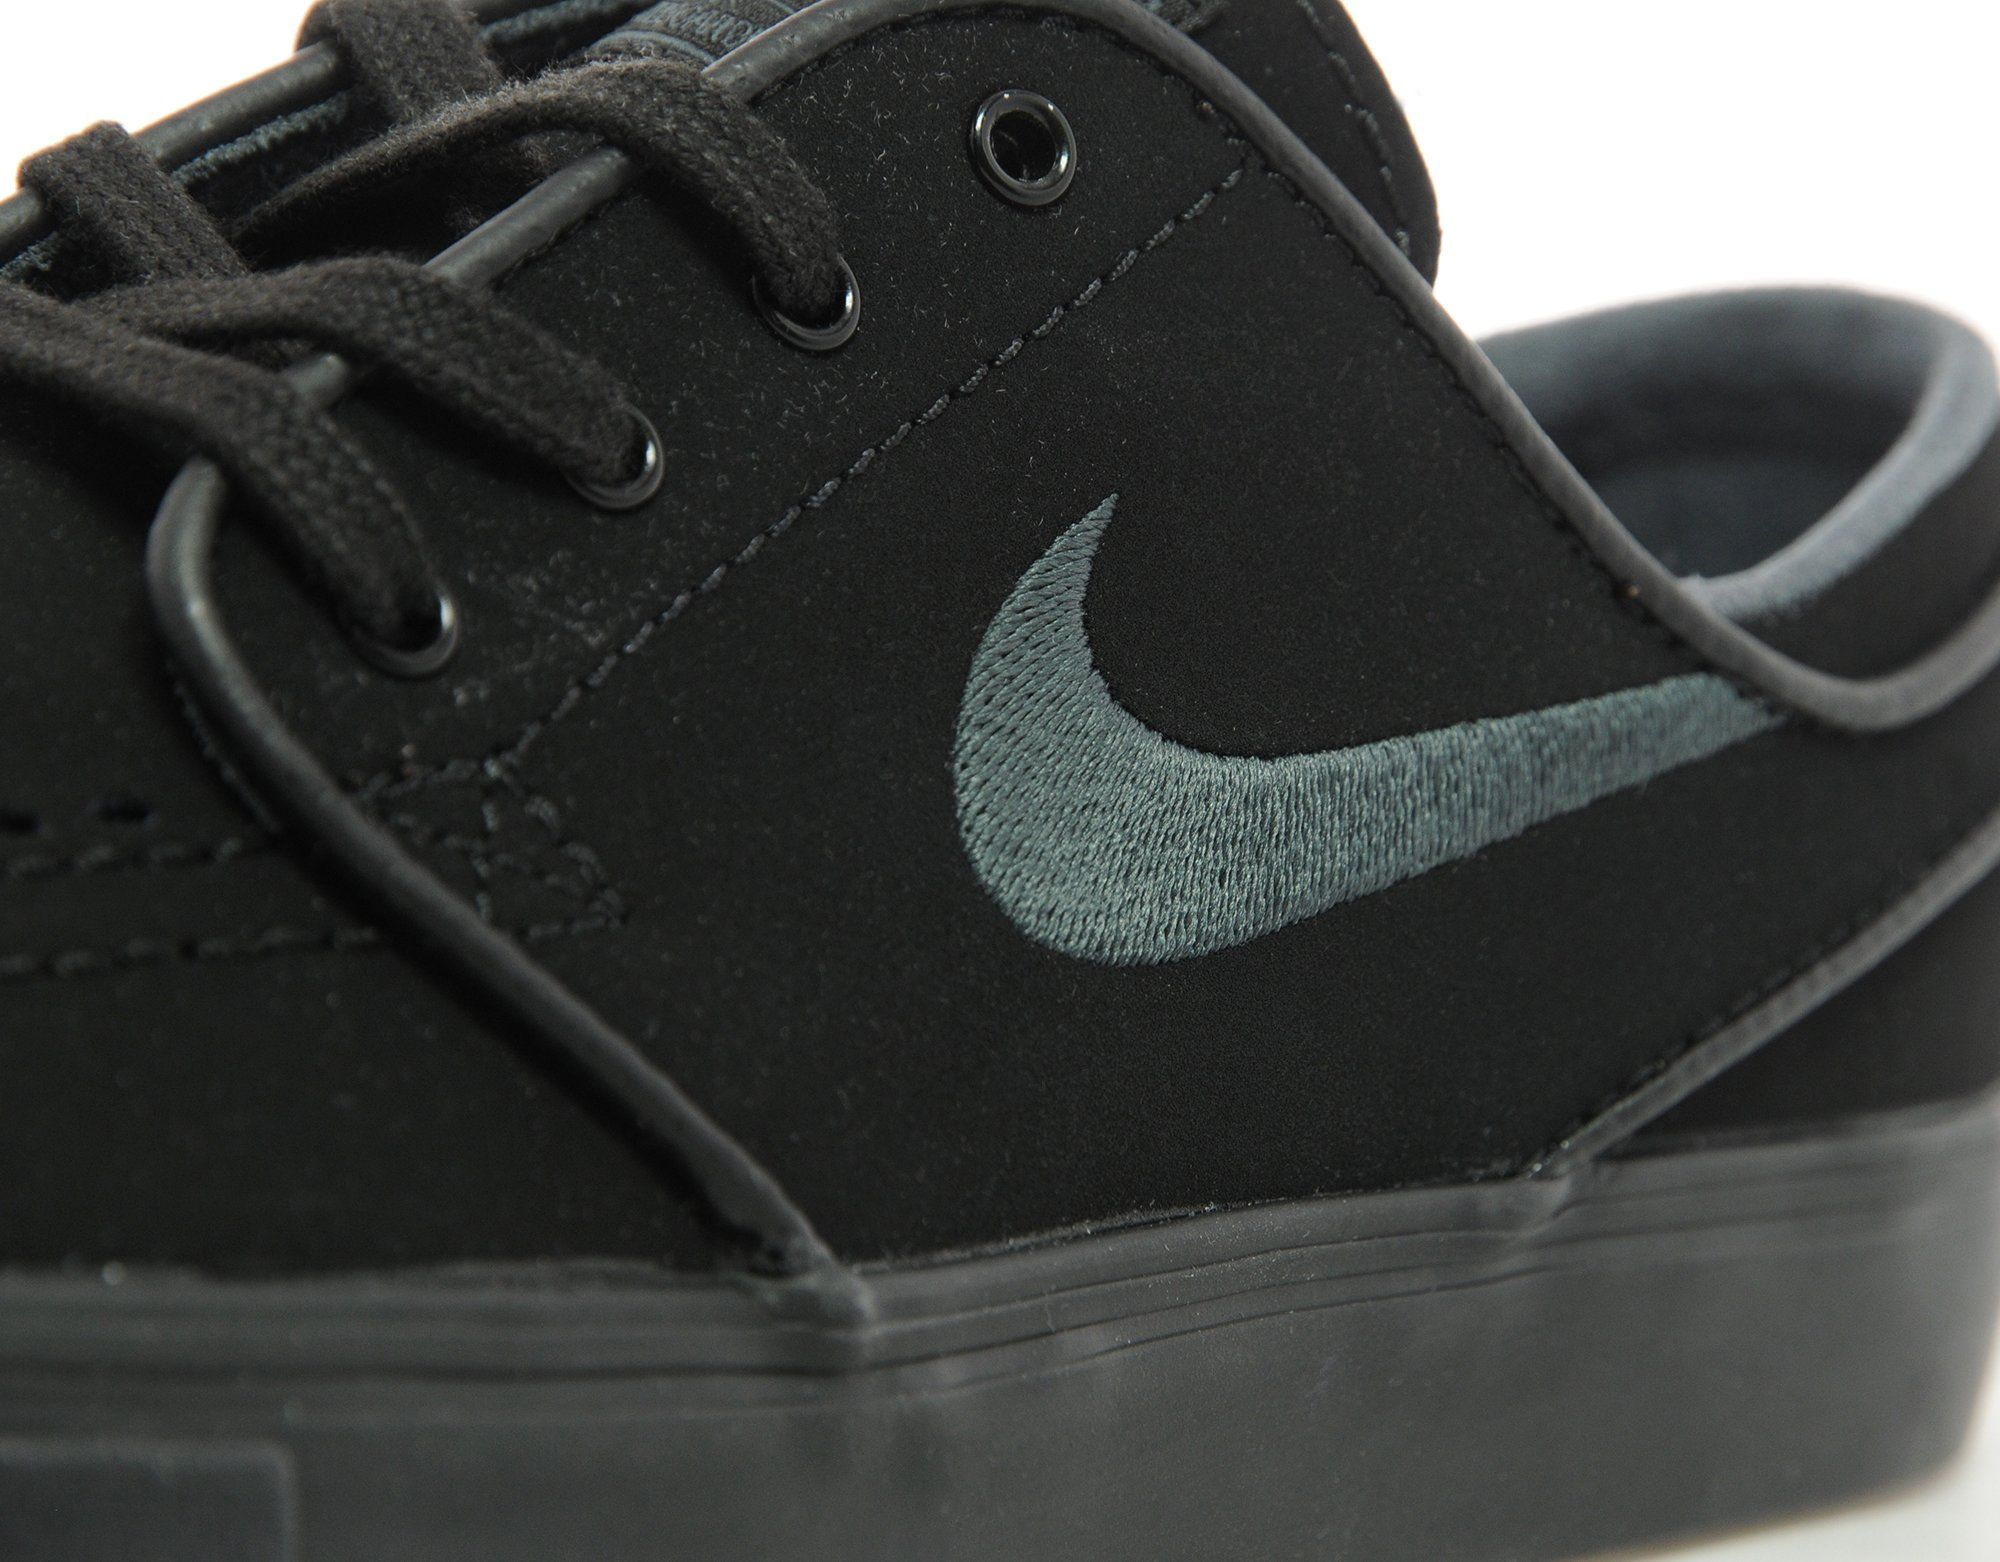 Nike SB Janoski Women's